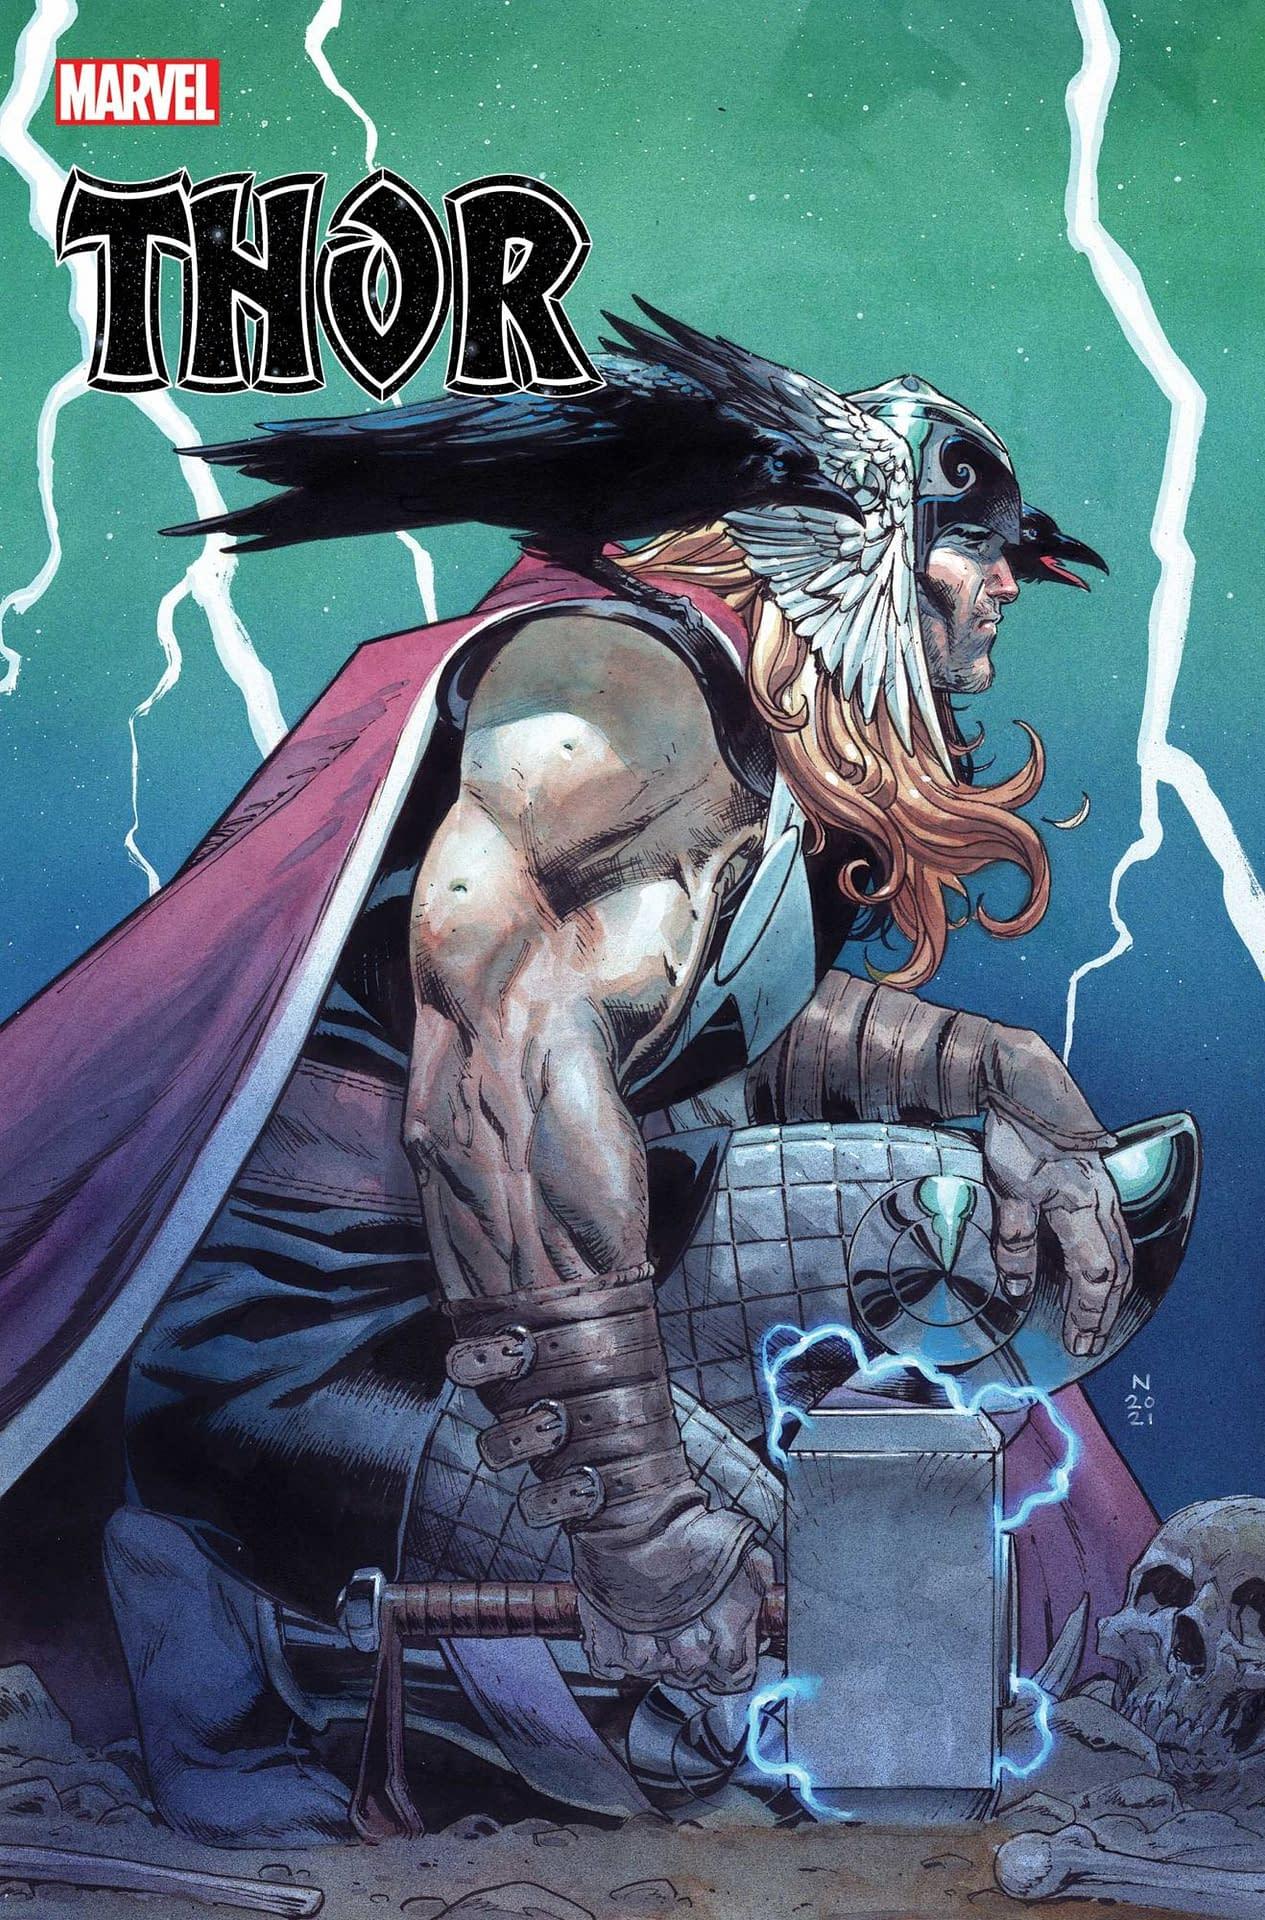 Alessandro Vitti No Longer New Artist On Thor? Michele Bandini On #15